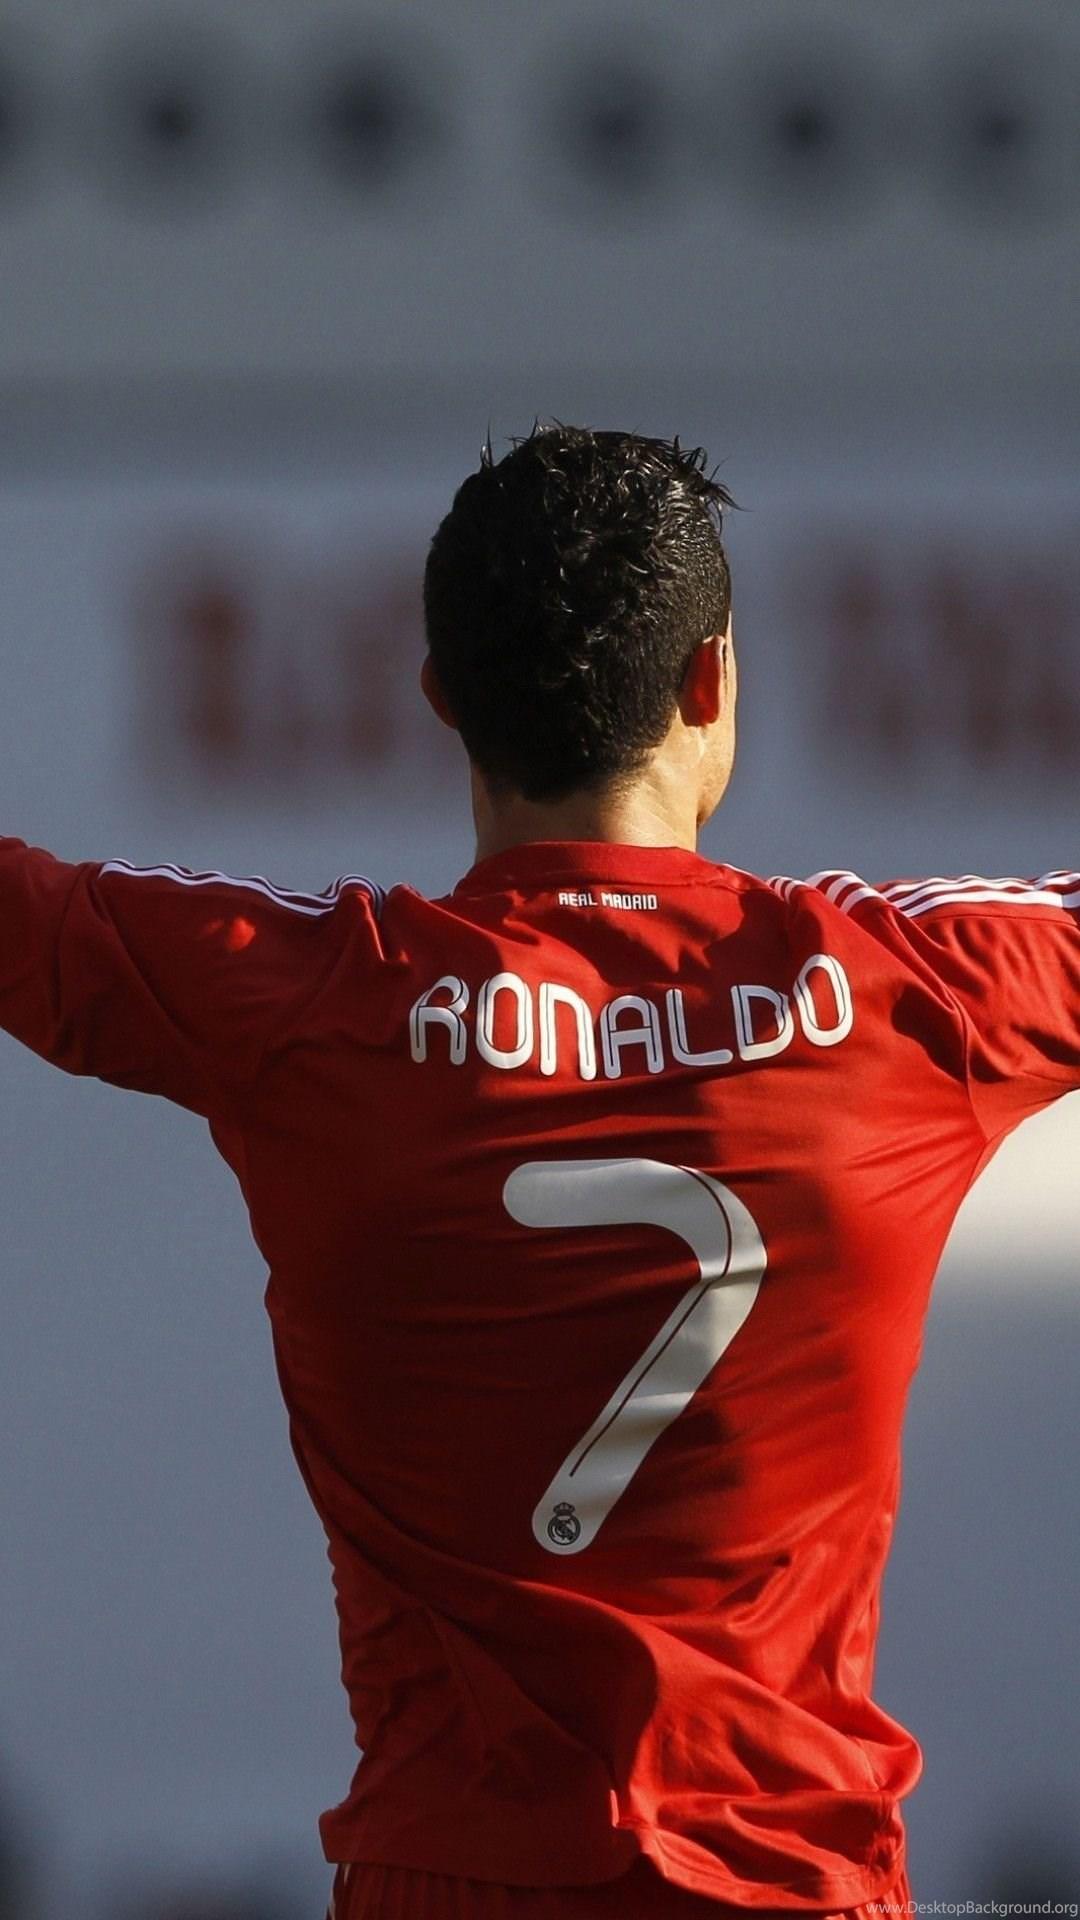 Cristiano Ronaldo Soccer Player Wallpapers Iphone 6 Plus Desktop Background